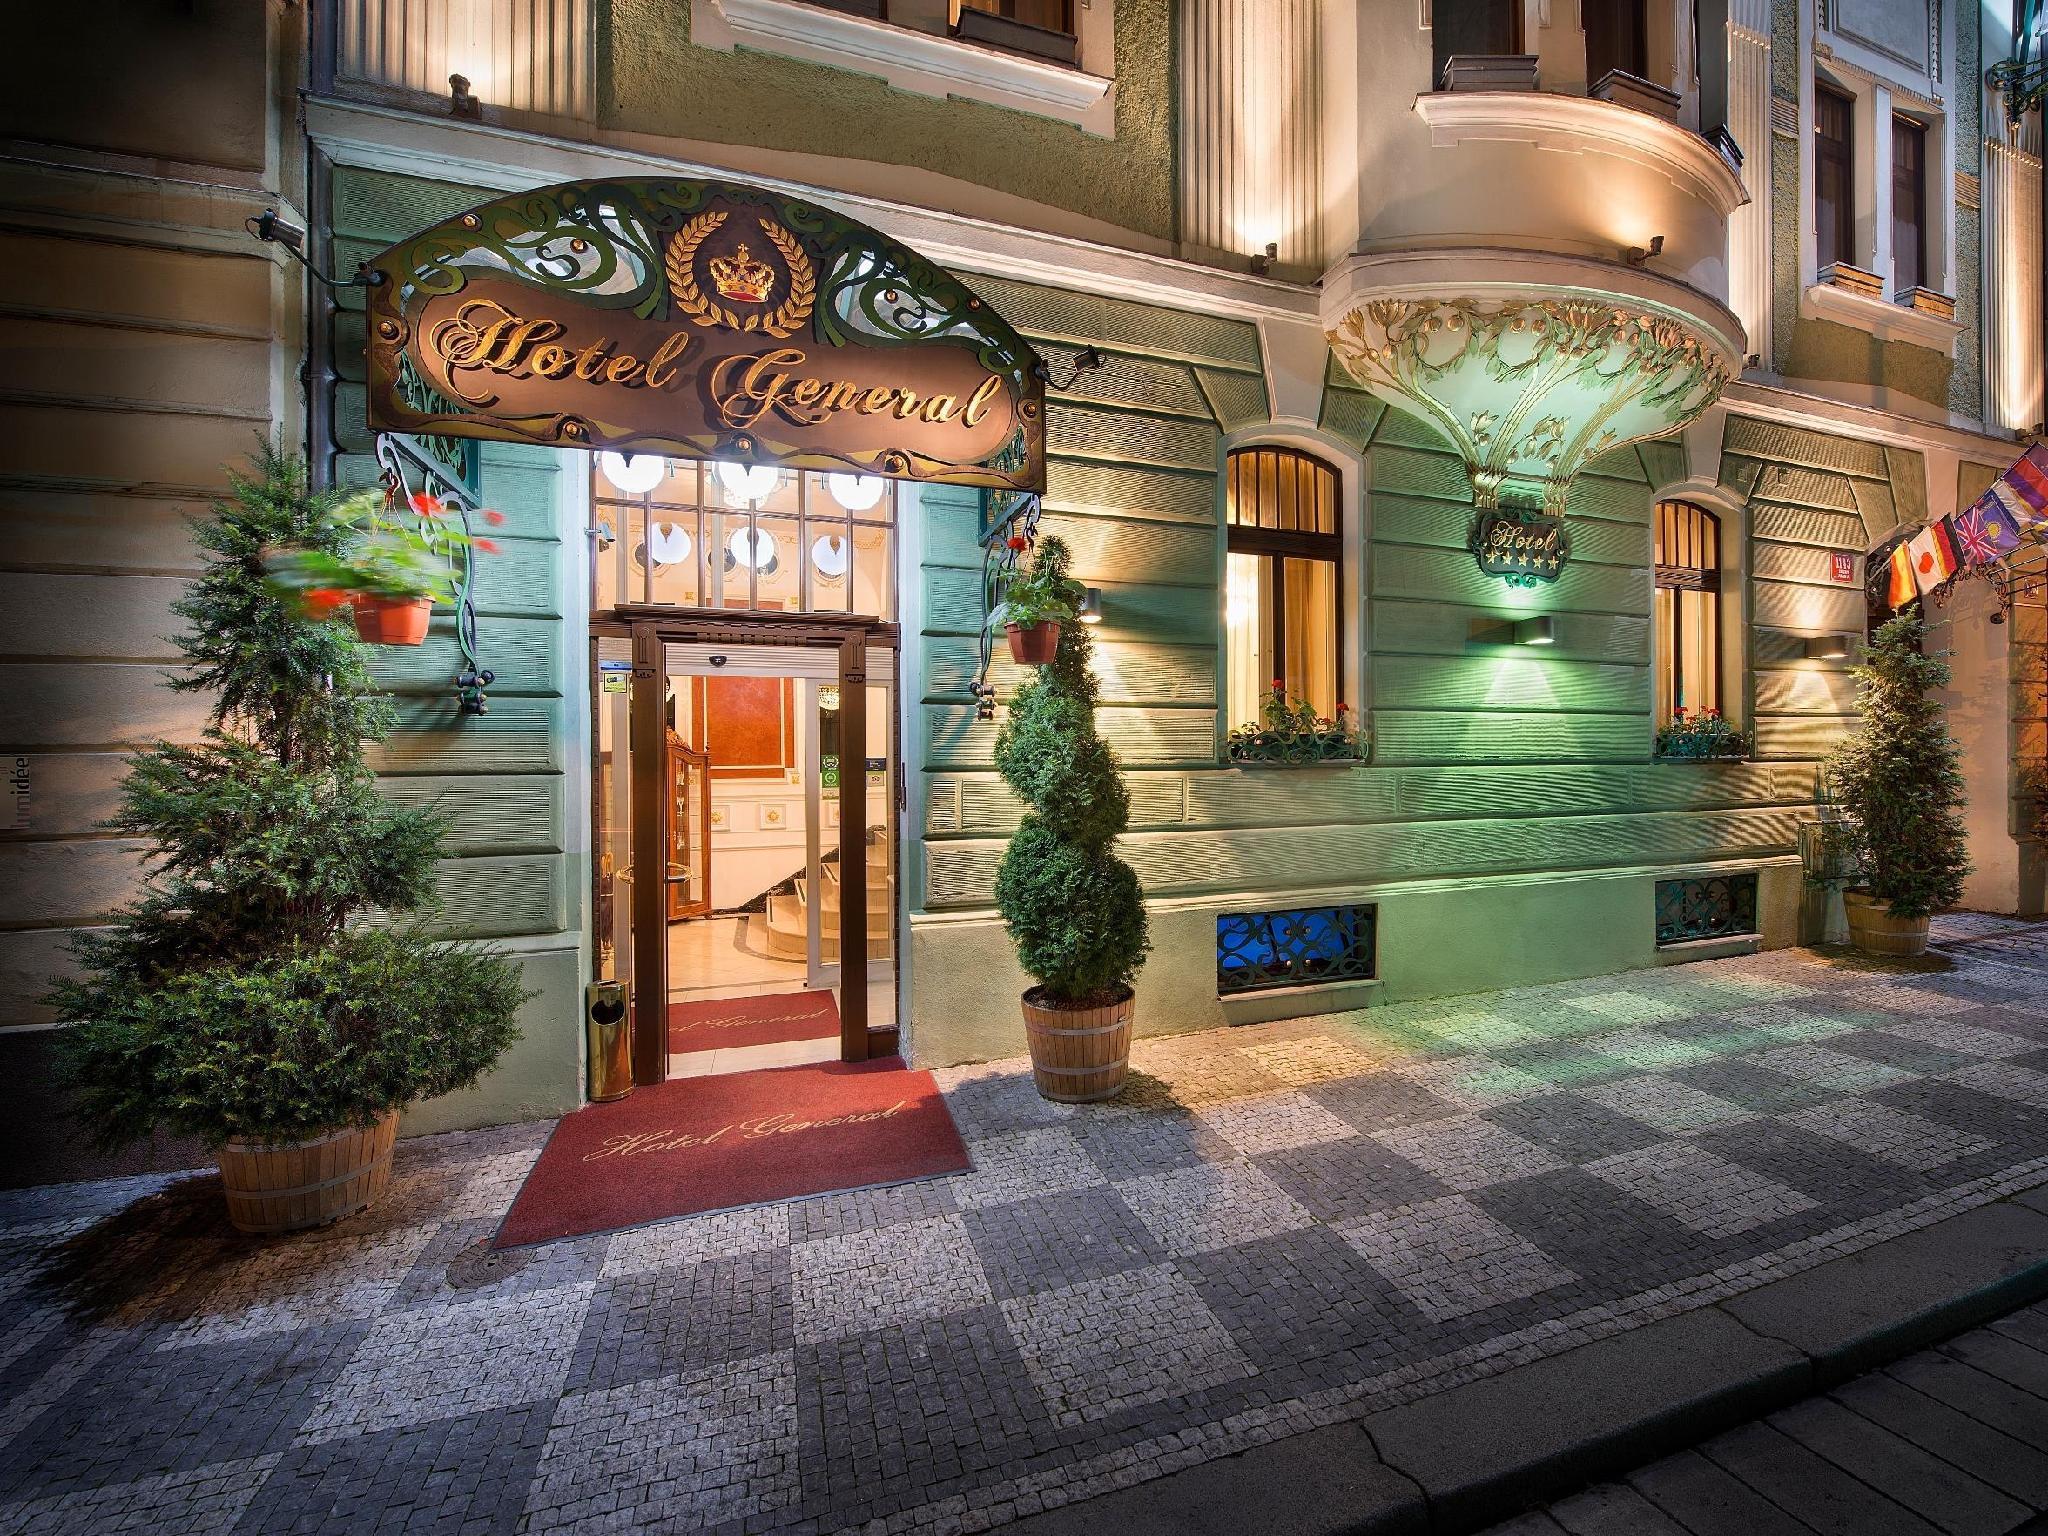 Hotel General Prague